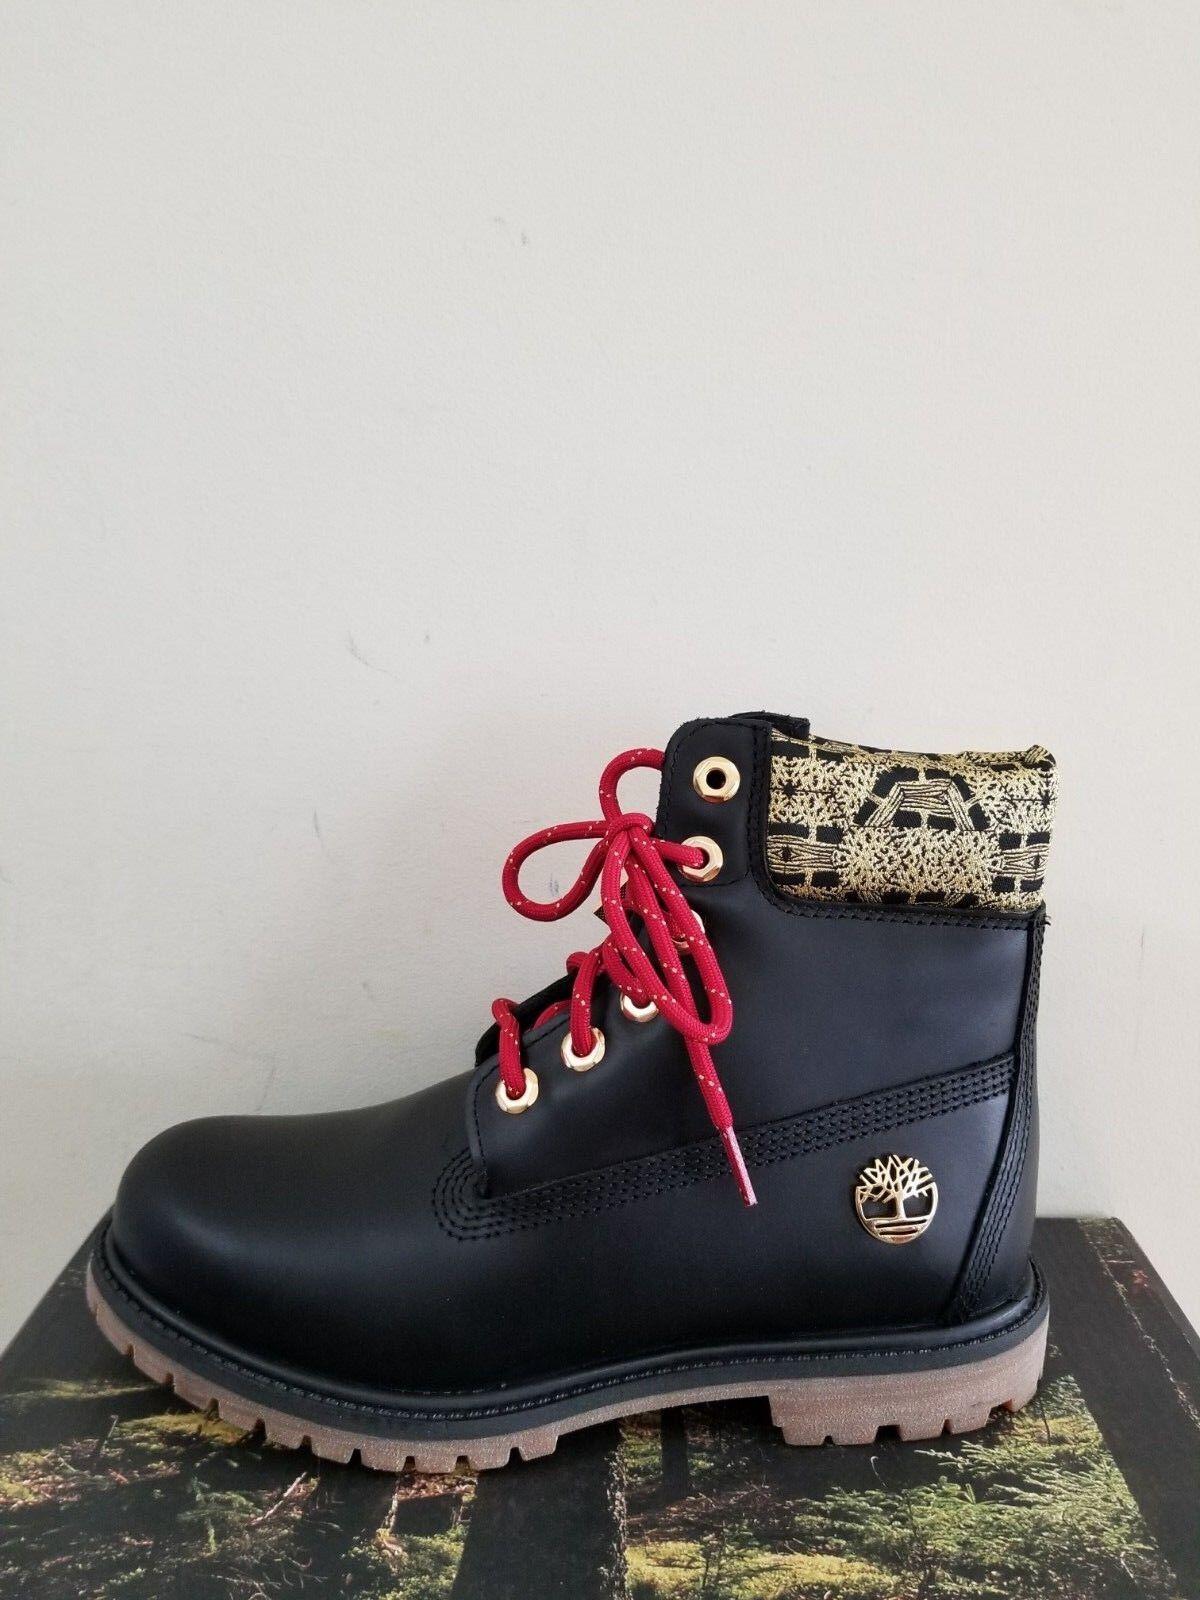 "Timberland Women's 6 inch"" Double Sole Premium Waterproof Boots NIB"